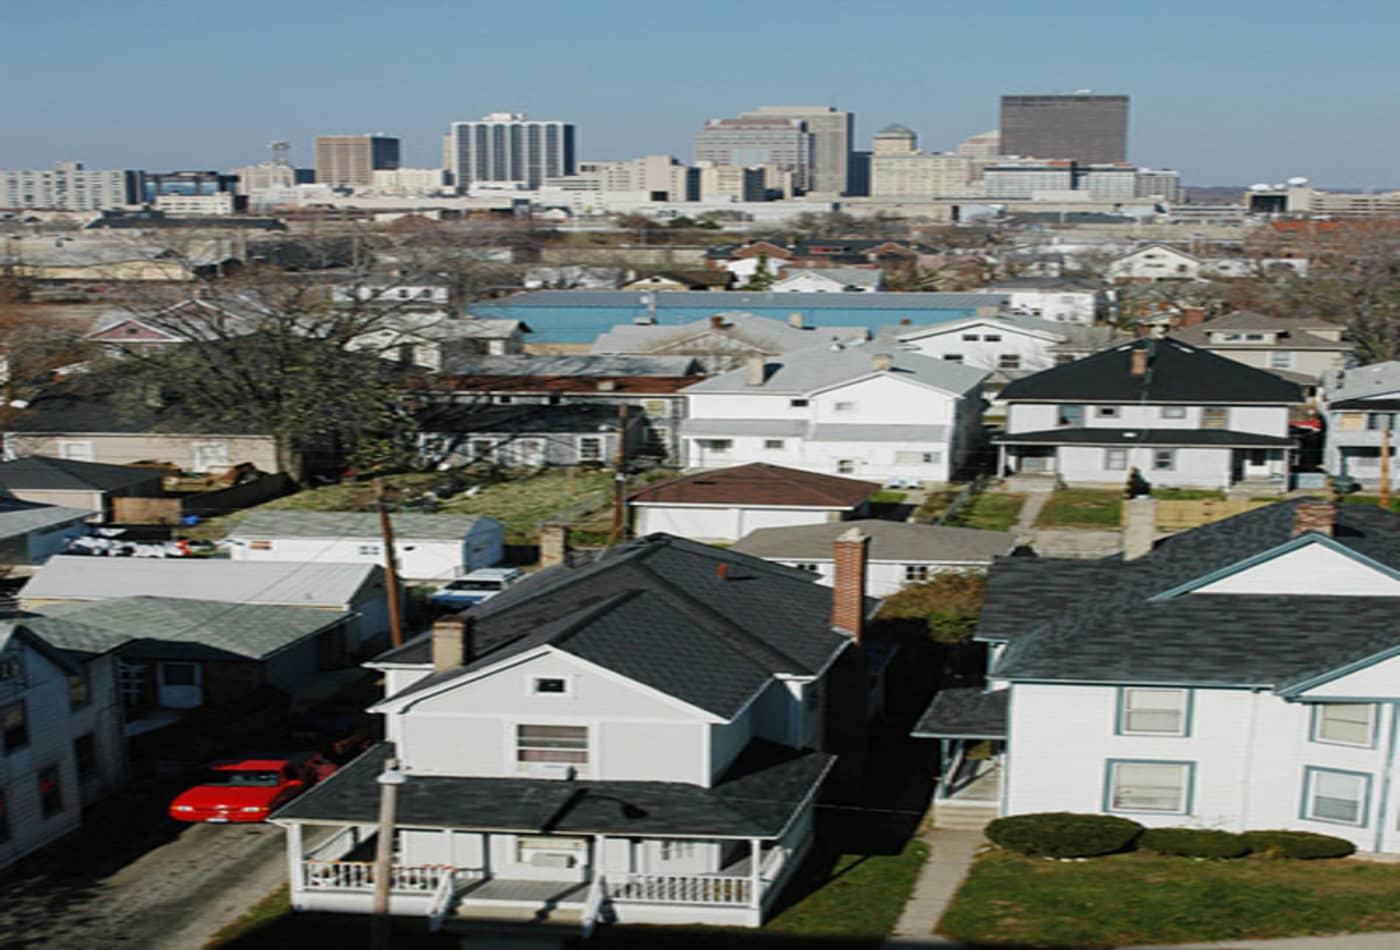 10-emptiest-us-cities-2012-dayton.jpg